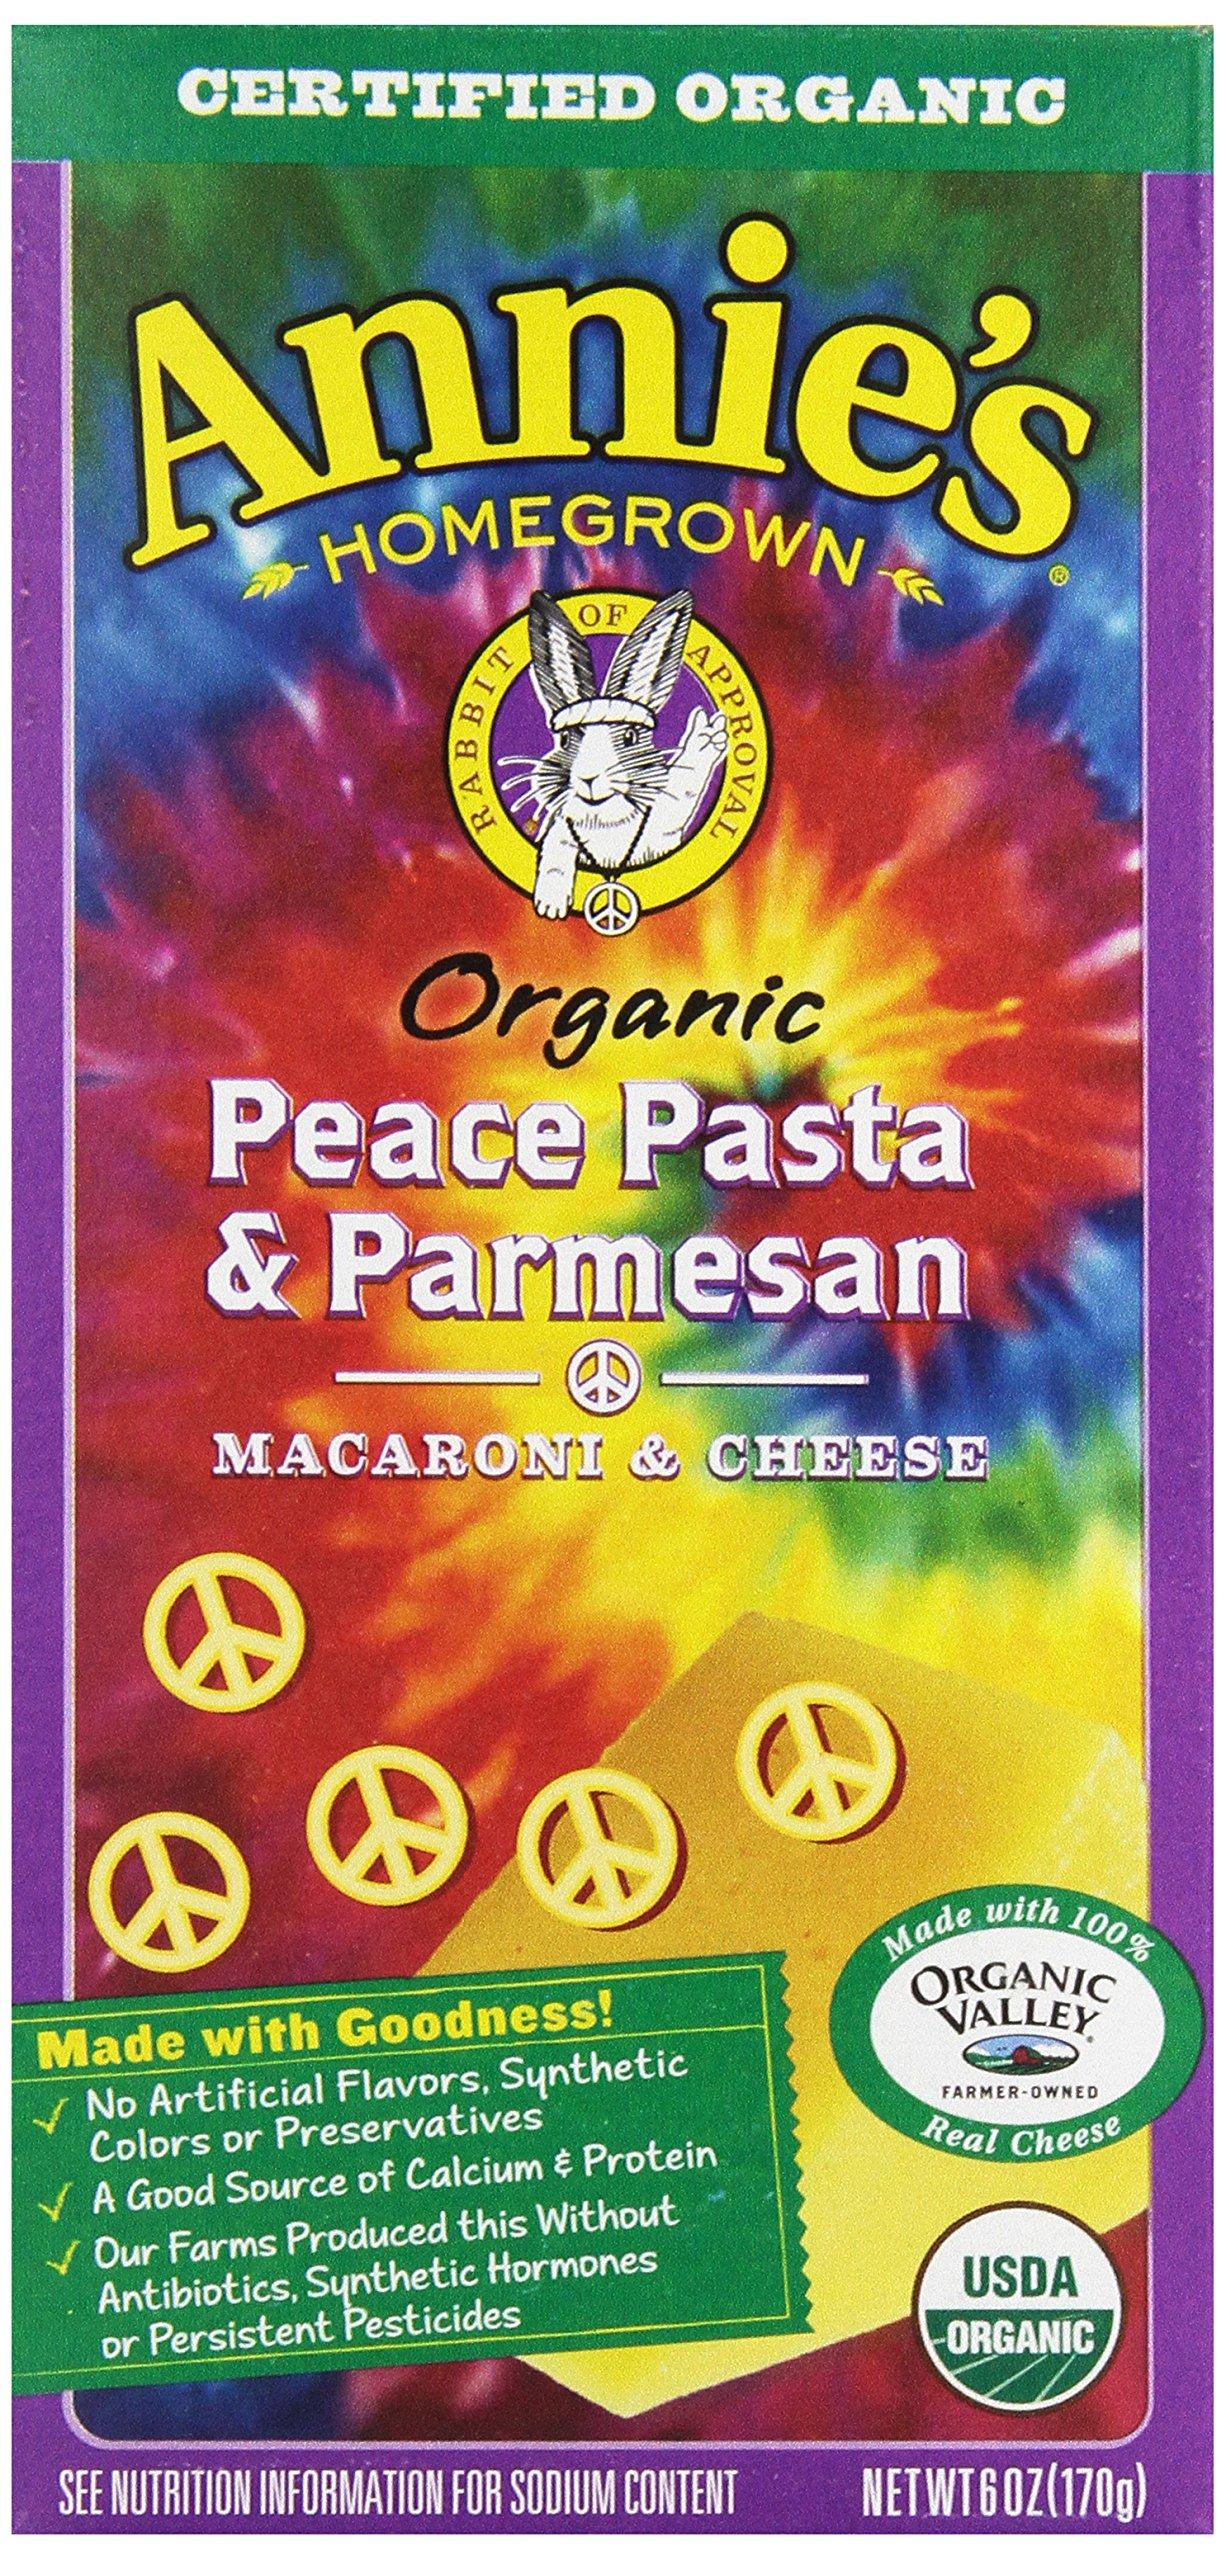 ANNIES HOMEGROWN PASTA PEACE & PARMS, 6 OZ